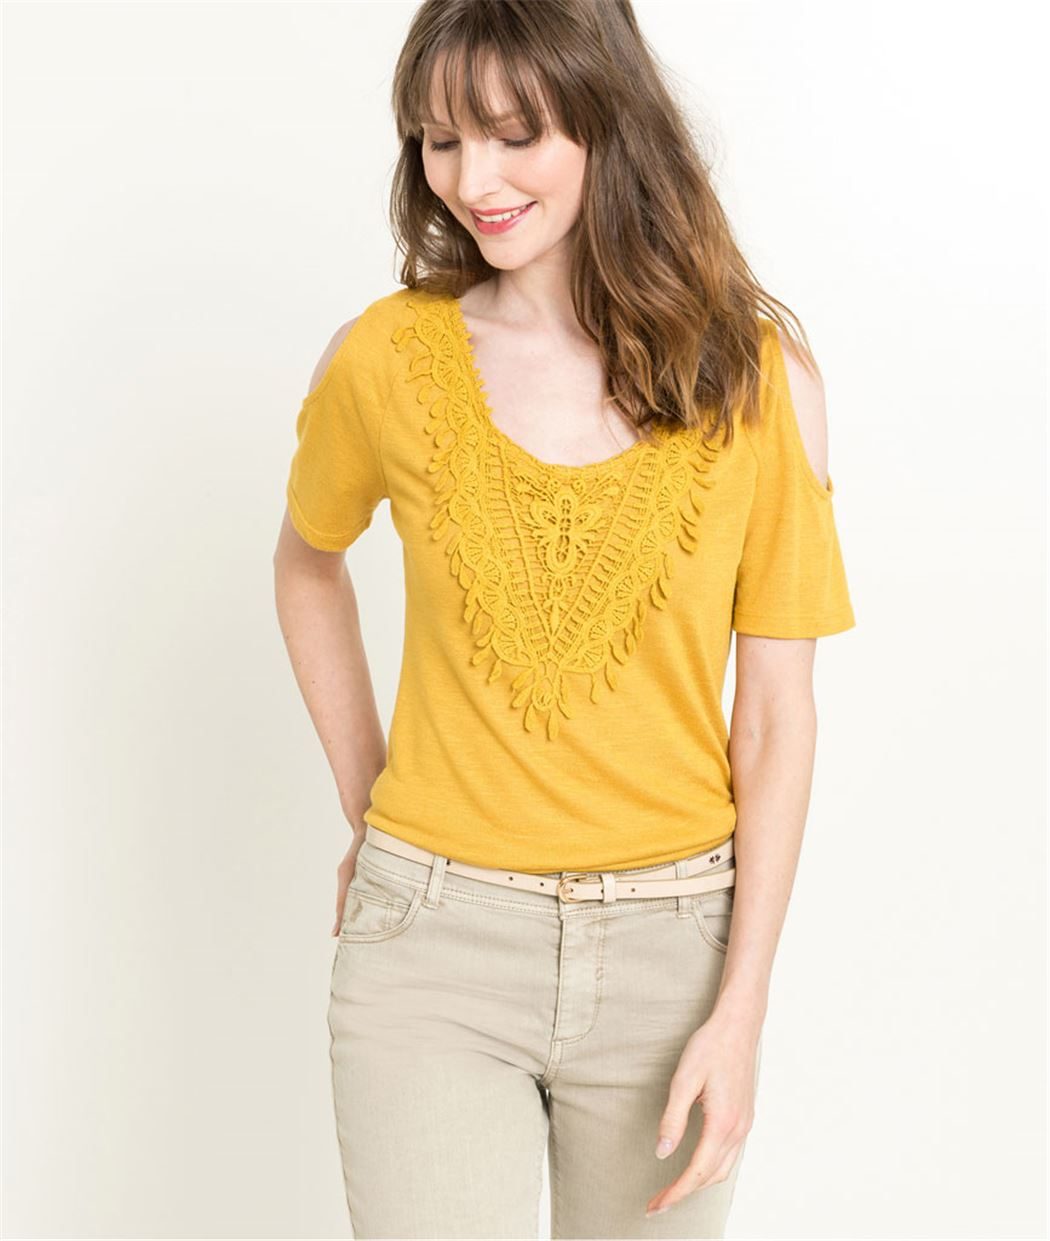 T-shirt femme manches courtes SAFRAN